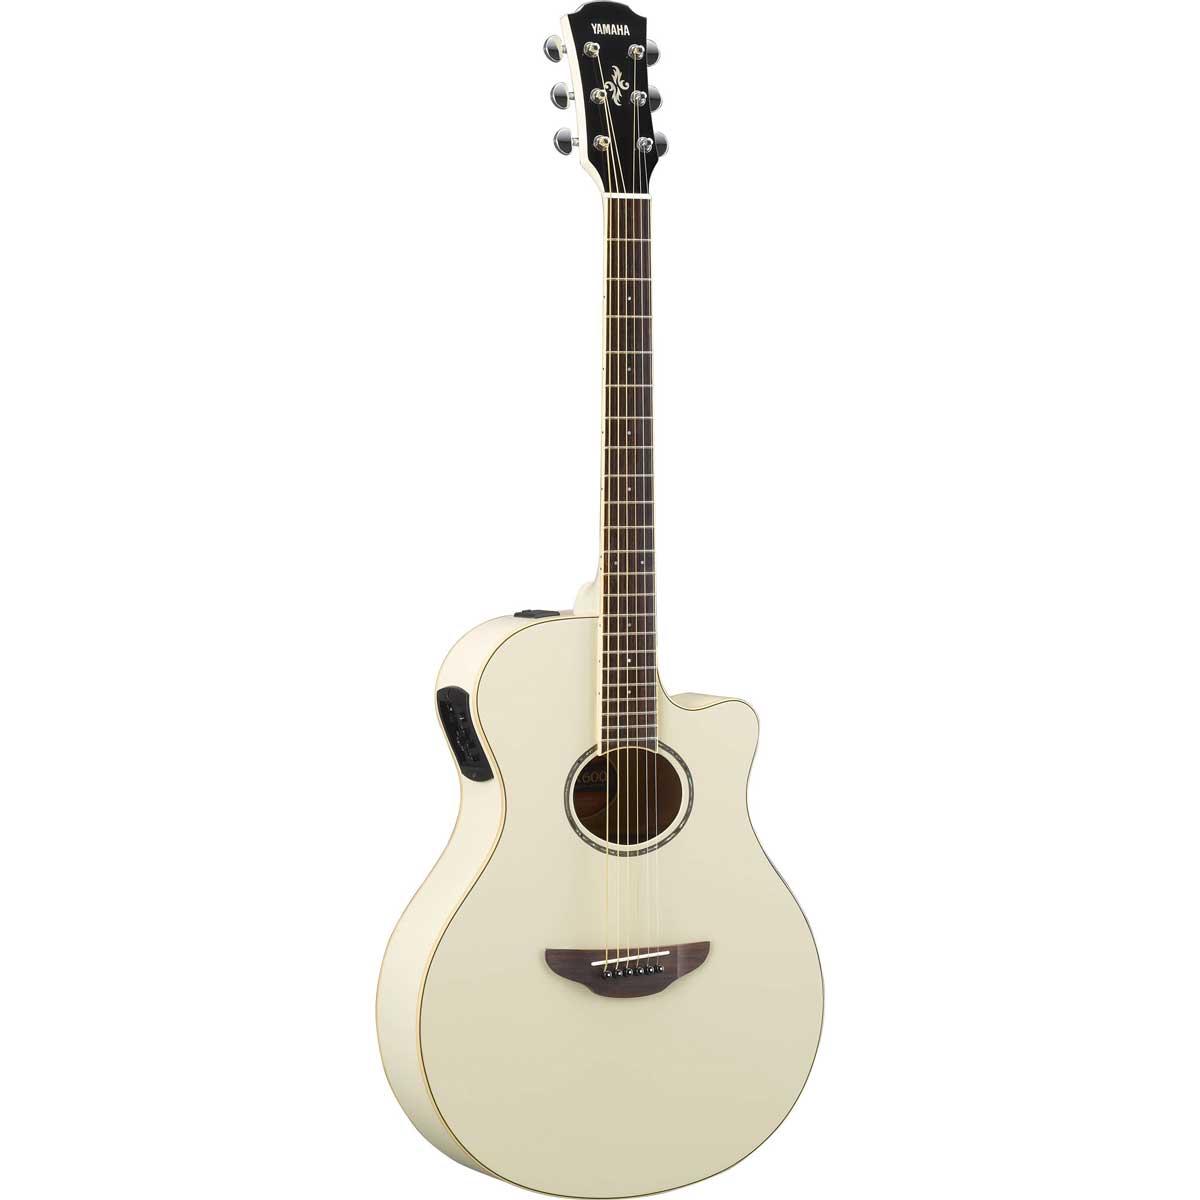 Yamaha APX-600 VW western-guitar vintage white